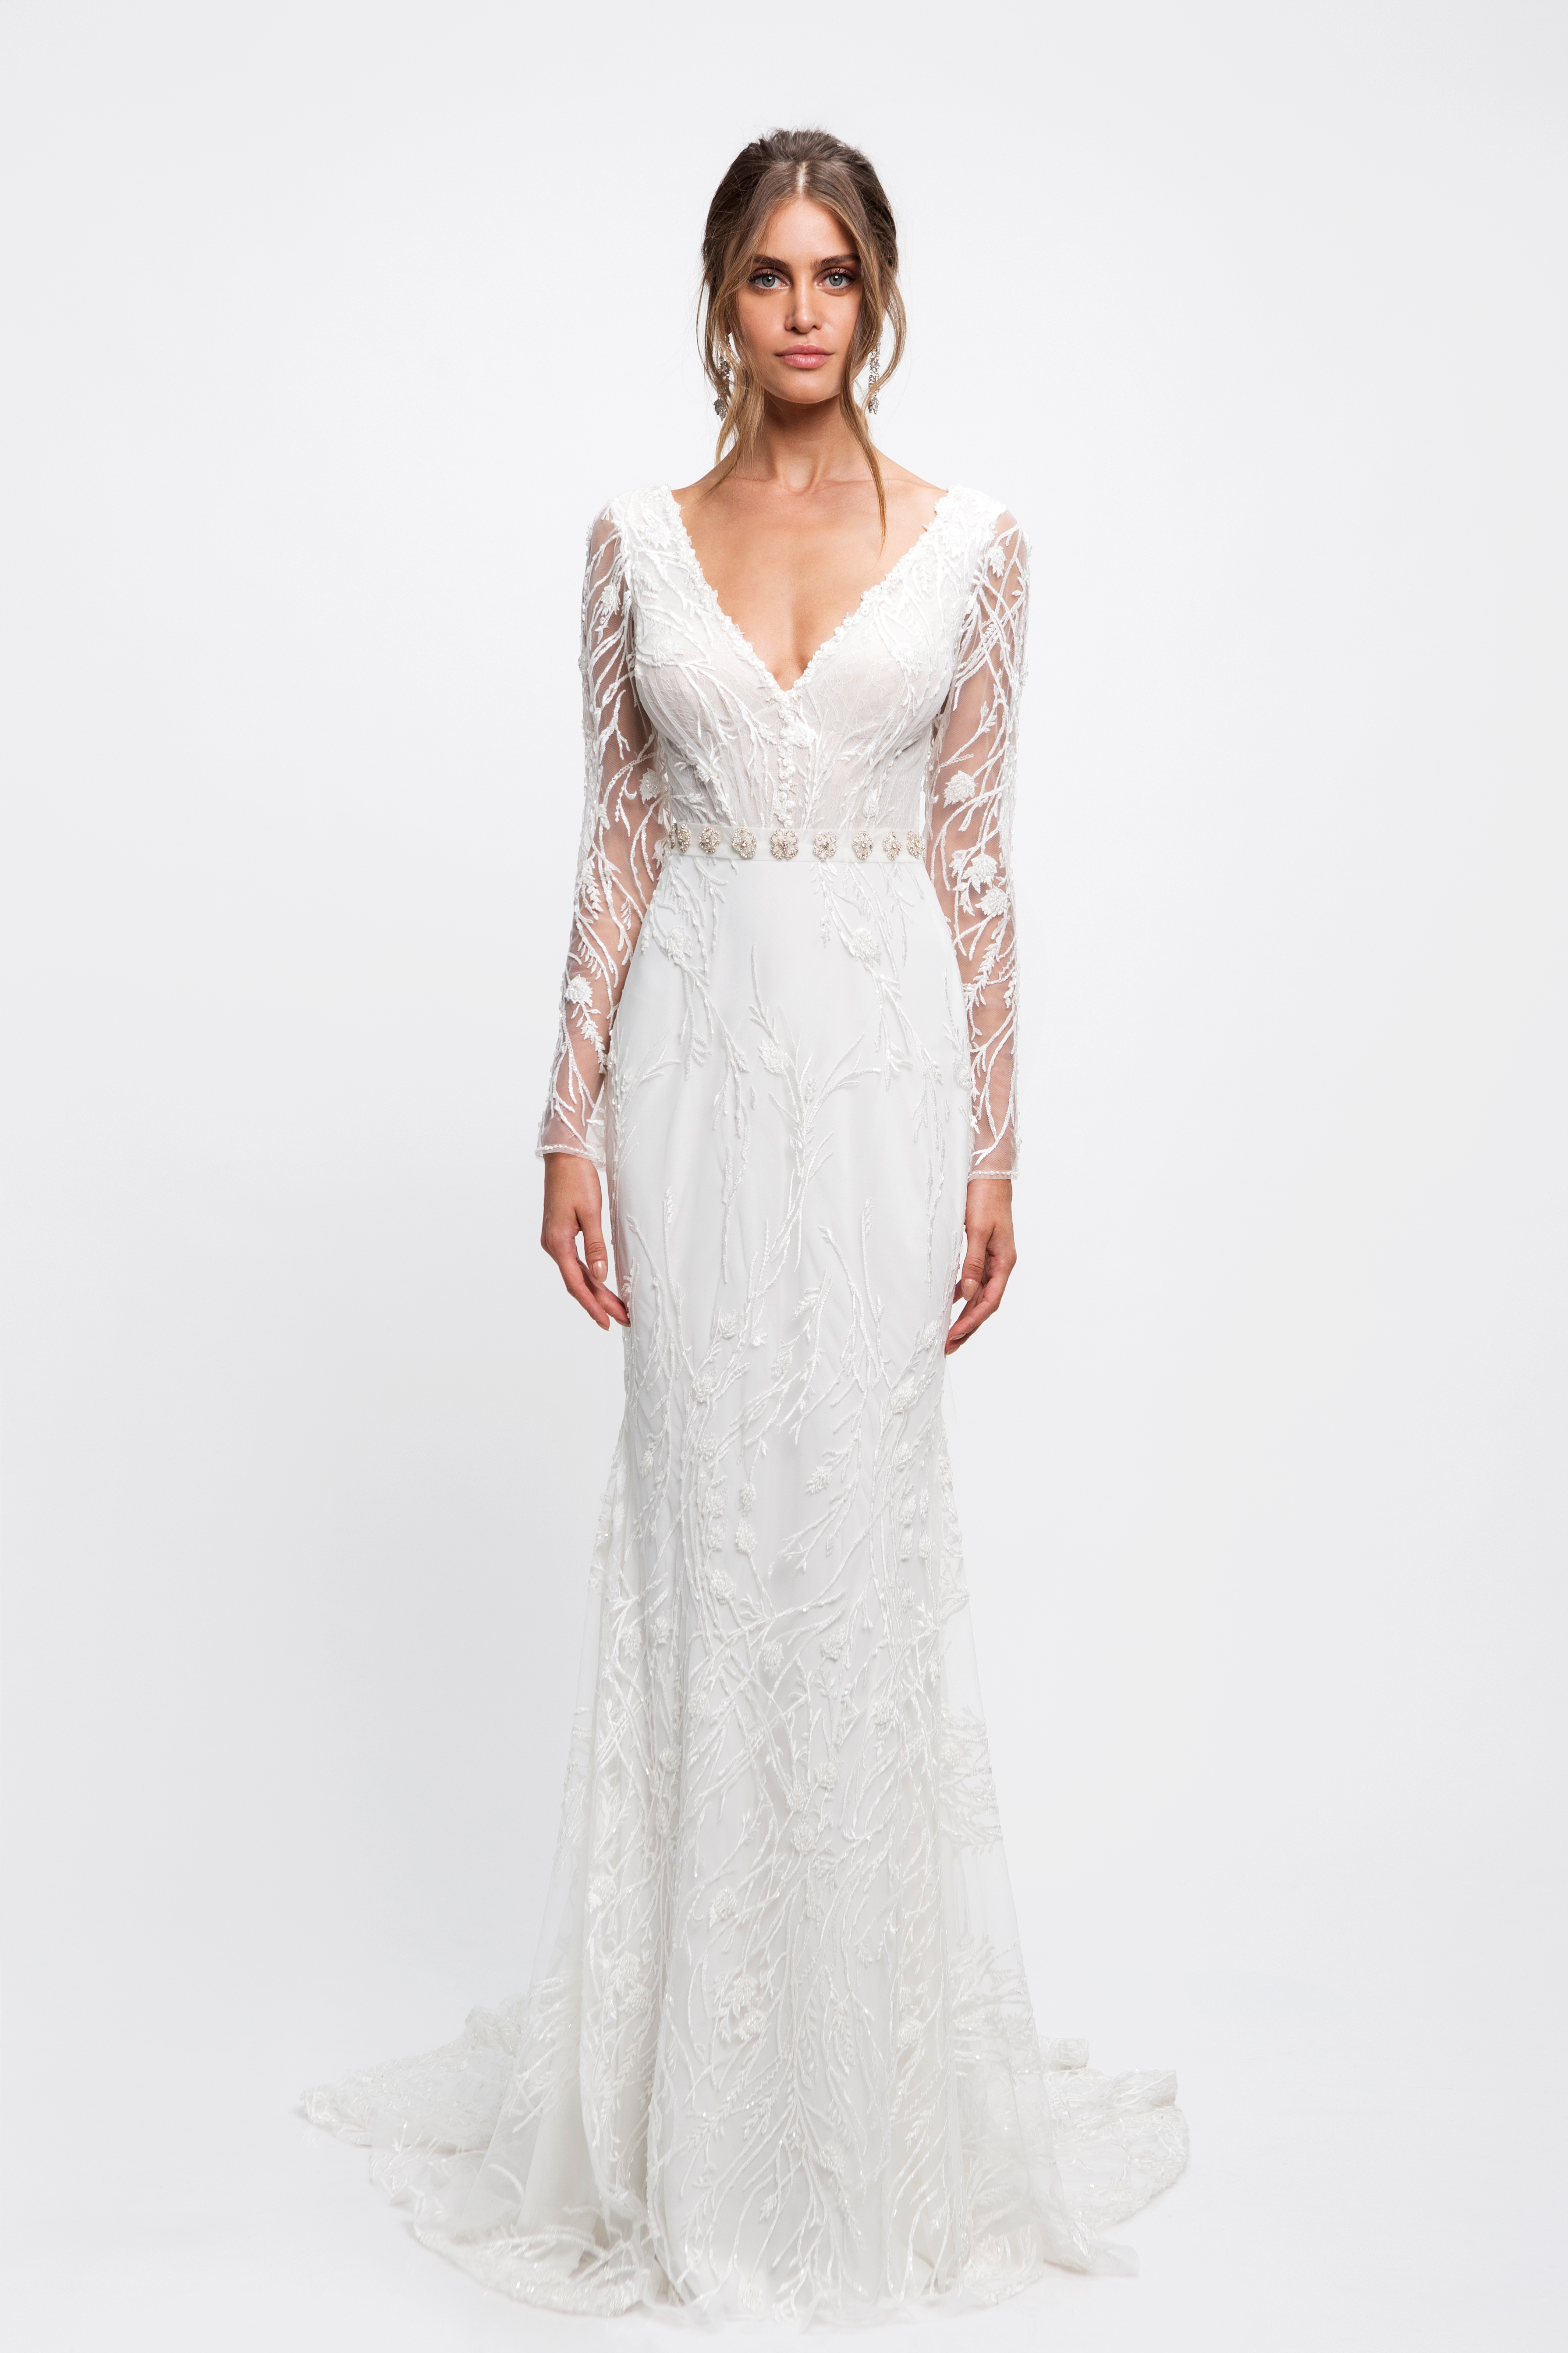 lihi hod wedding dress long sleeves v-neck beaded trumpet